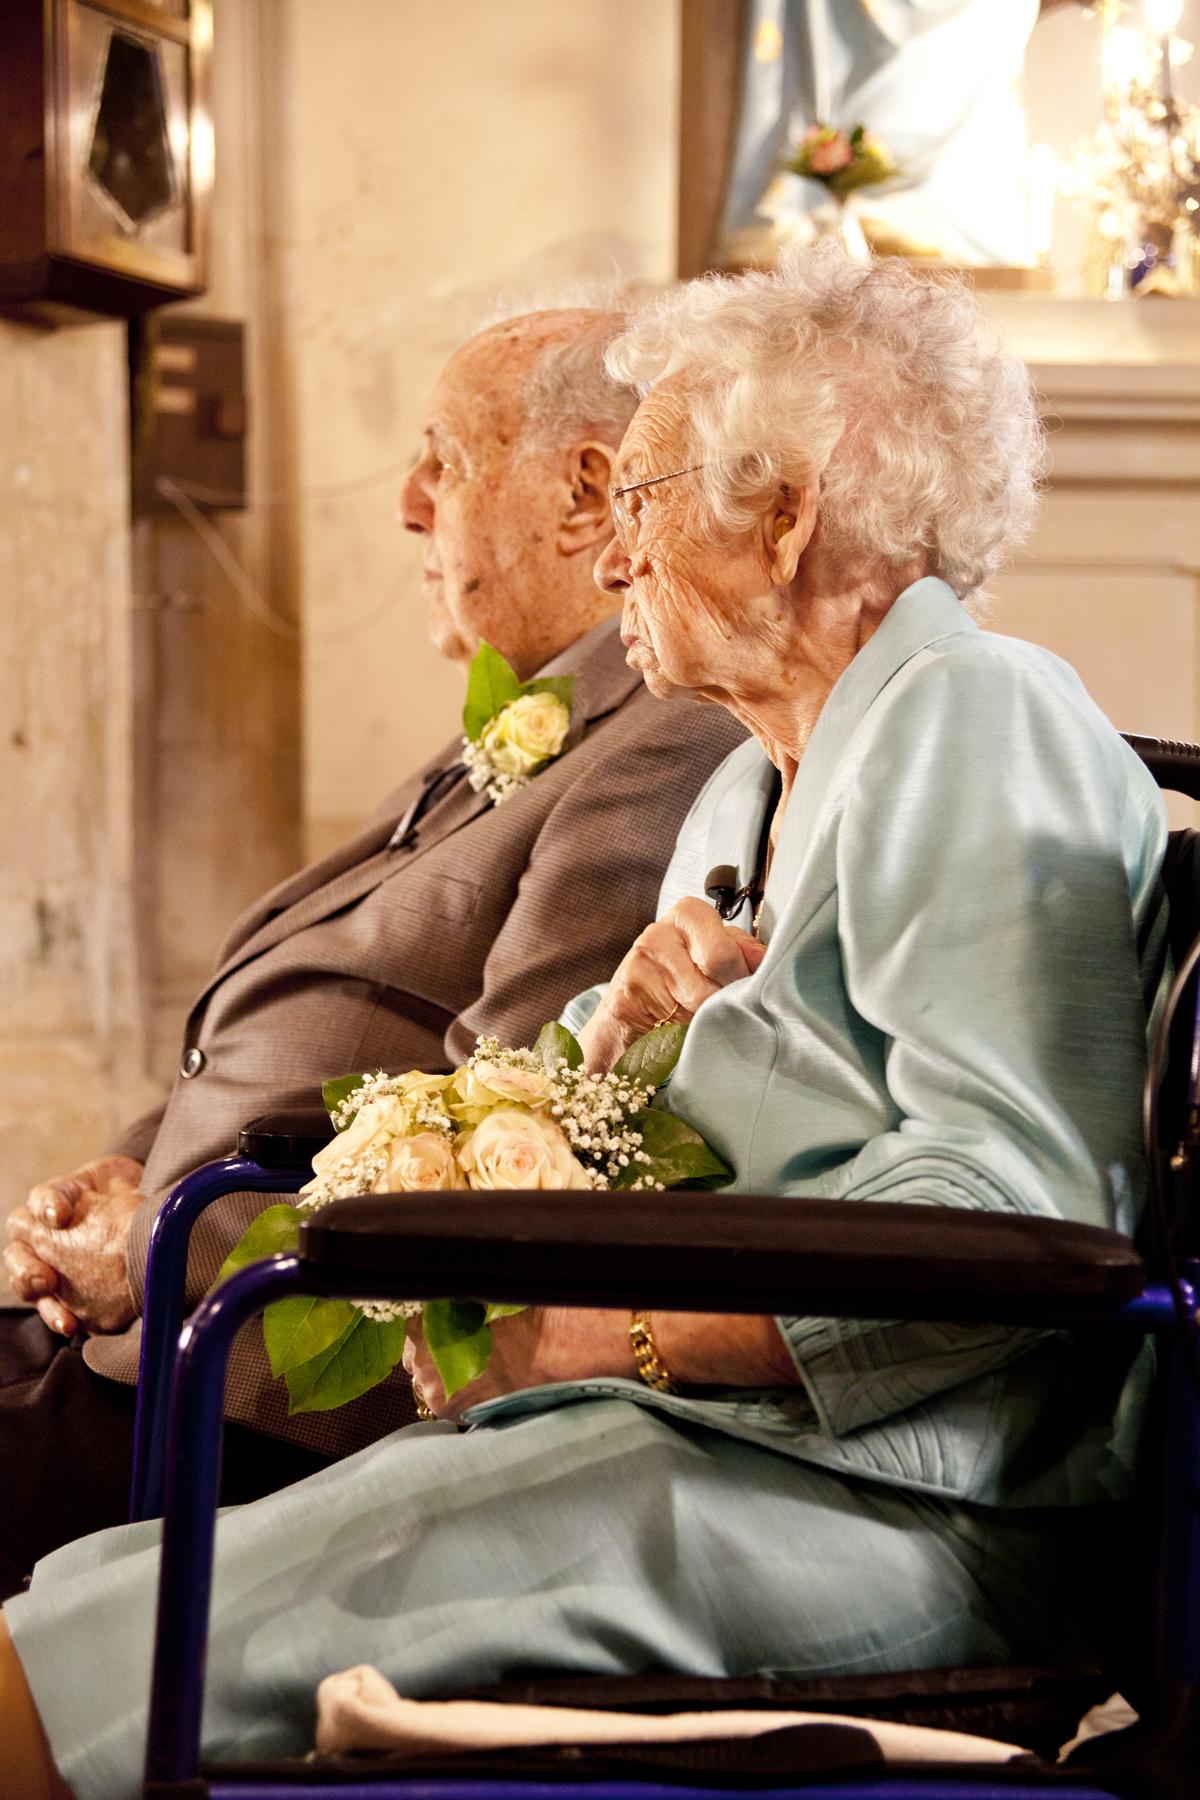 Reciting vows (again)